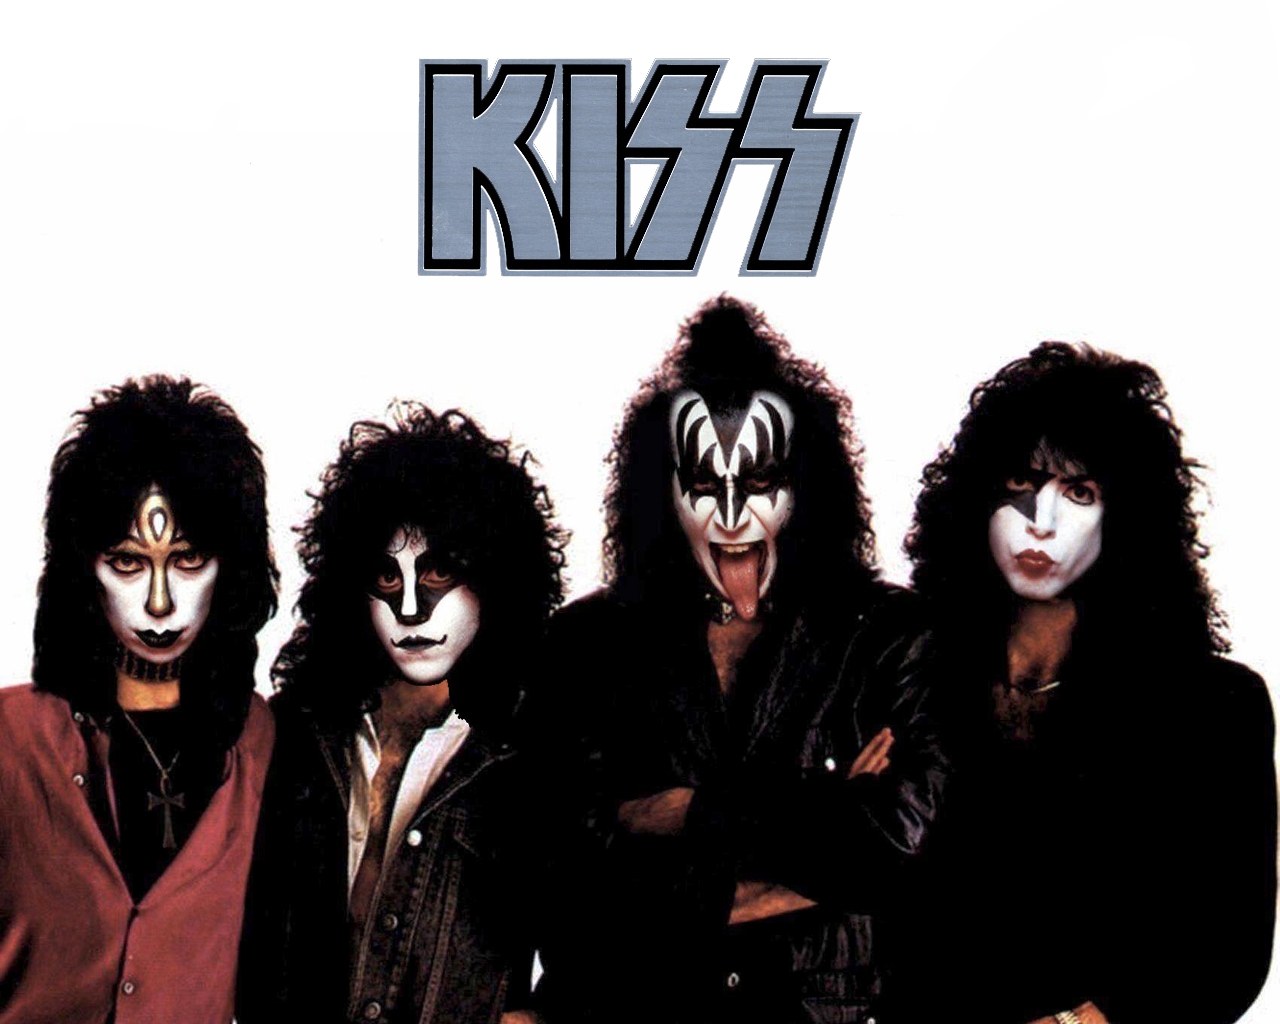 1280x1024 kiss music band 1280x1024 wallpaper Wallpaper 1280x1024